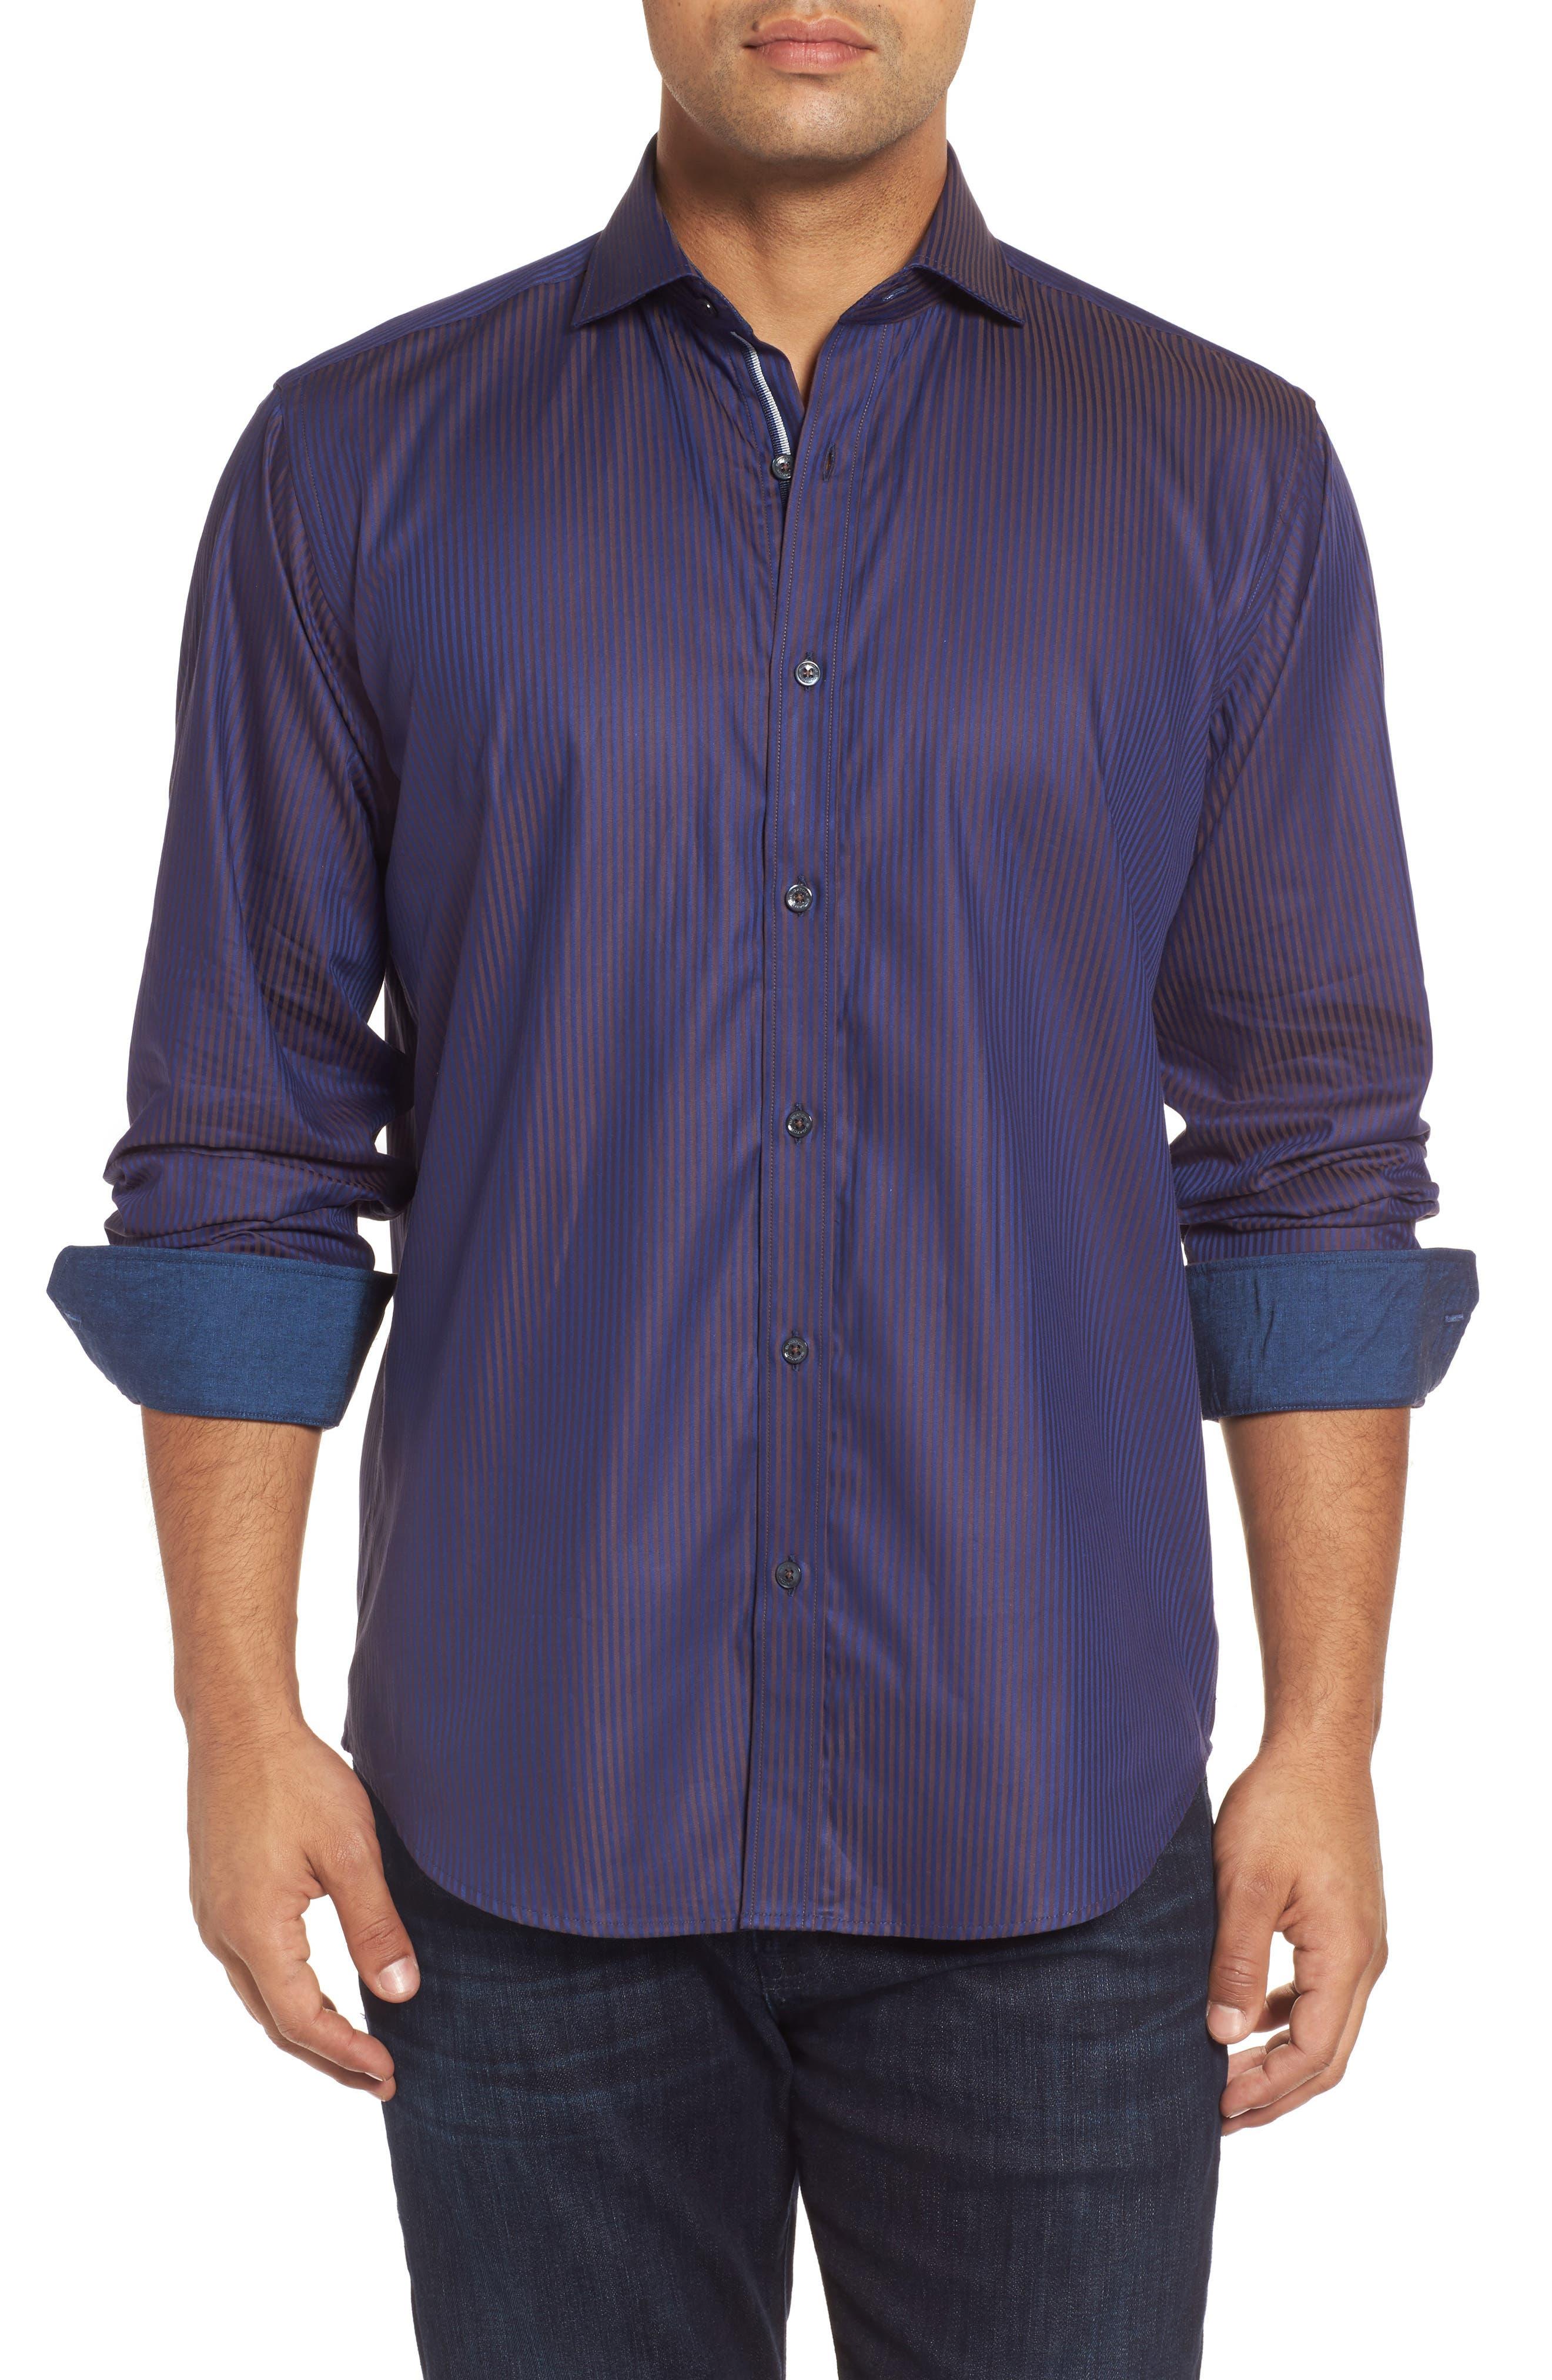 Main Image - Bugatchi Classic Fit Herringbone Pinstripe Sport Shirt